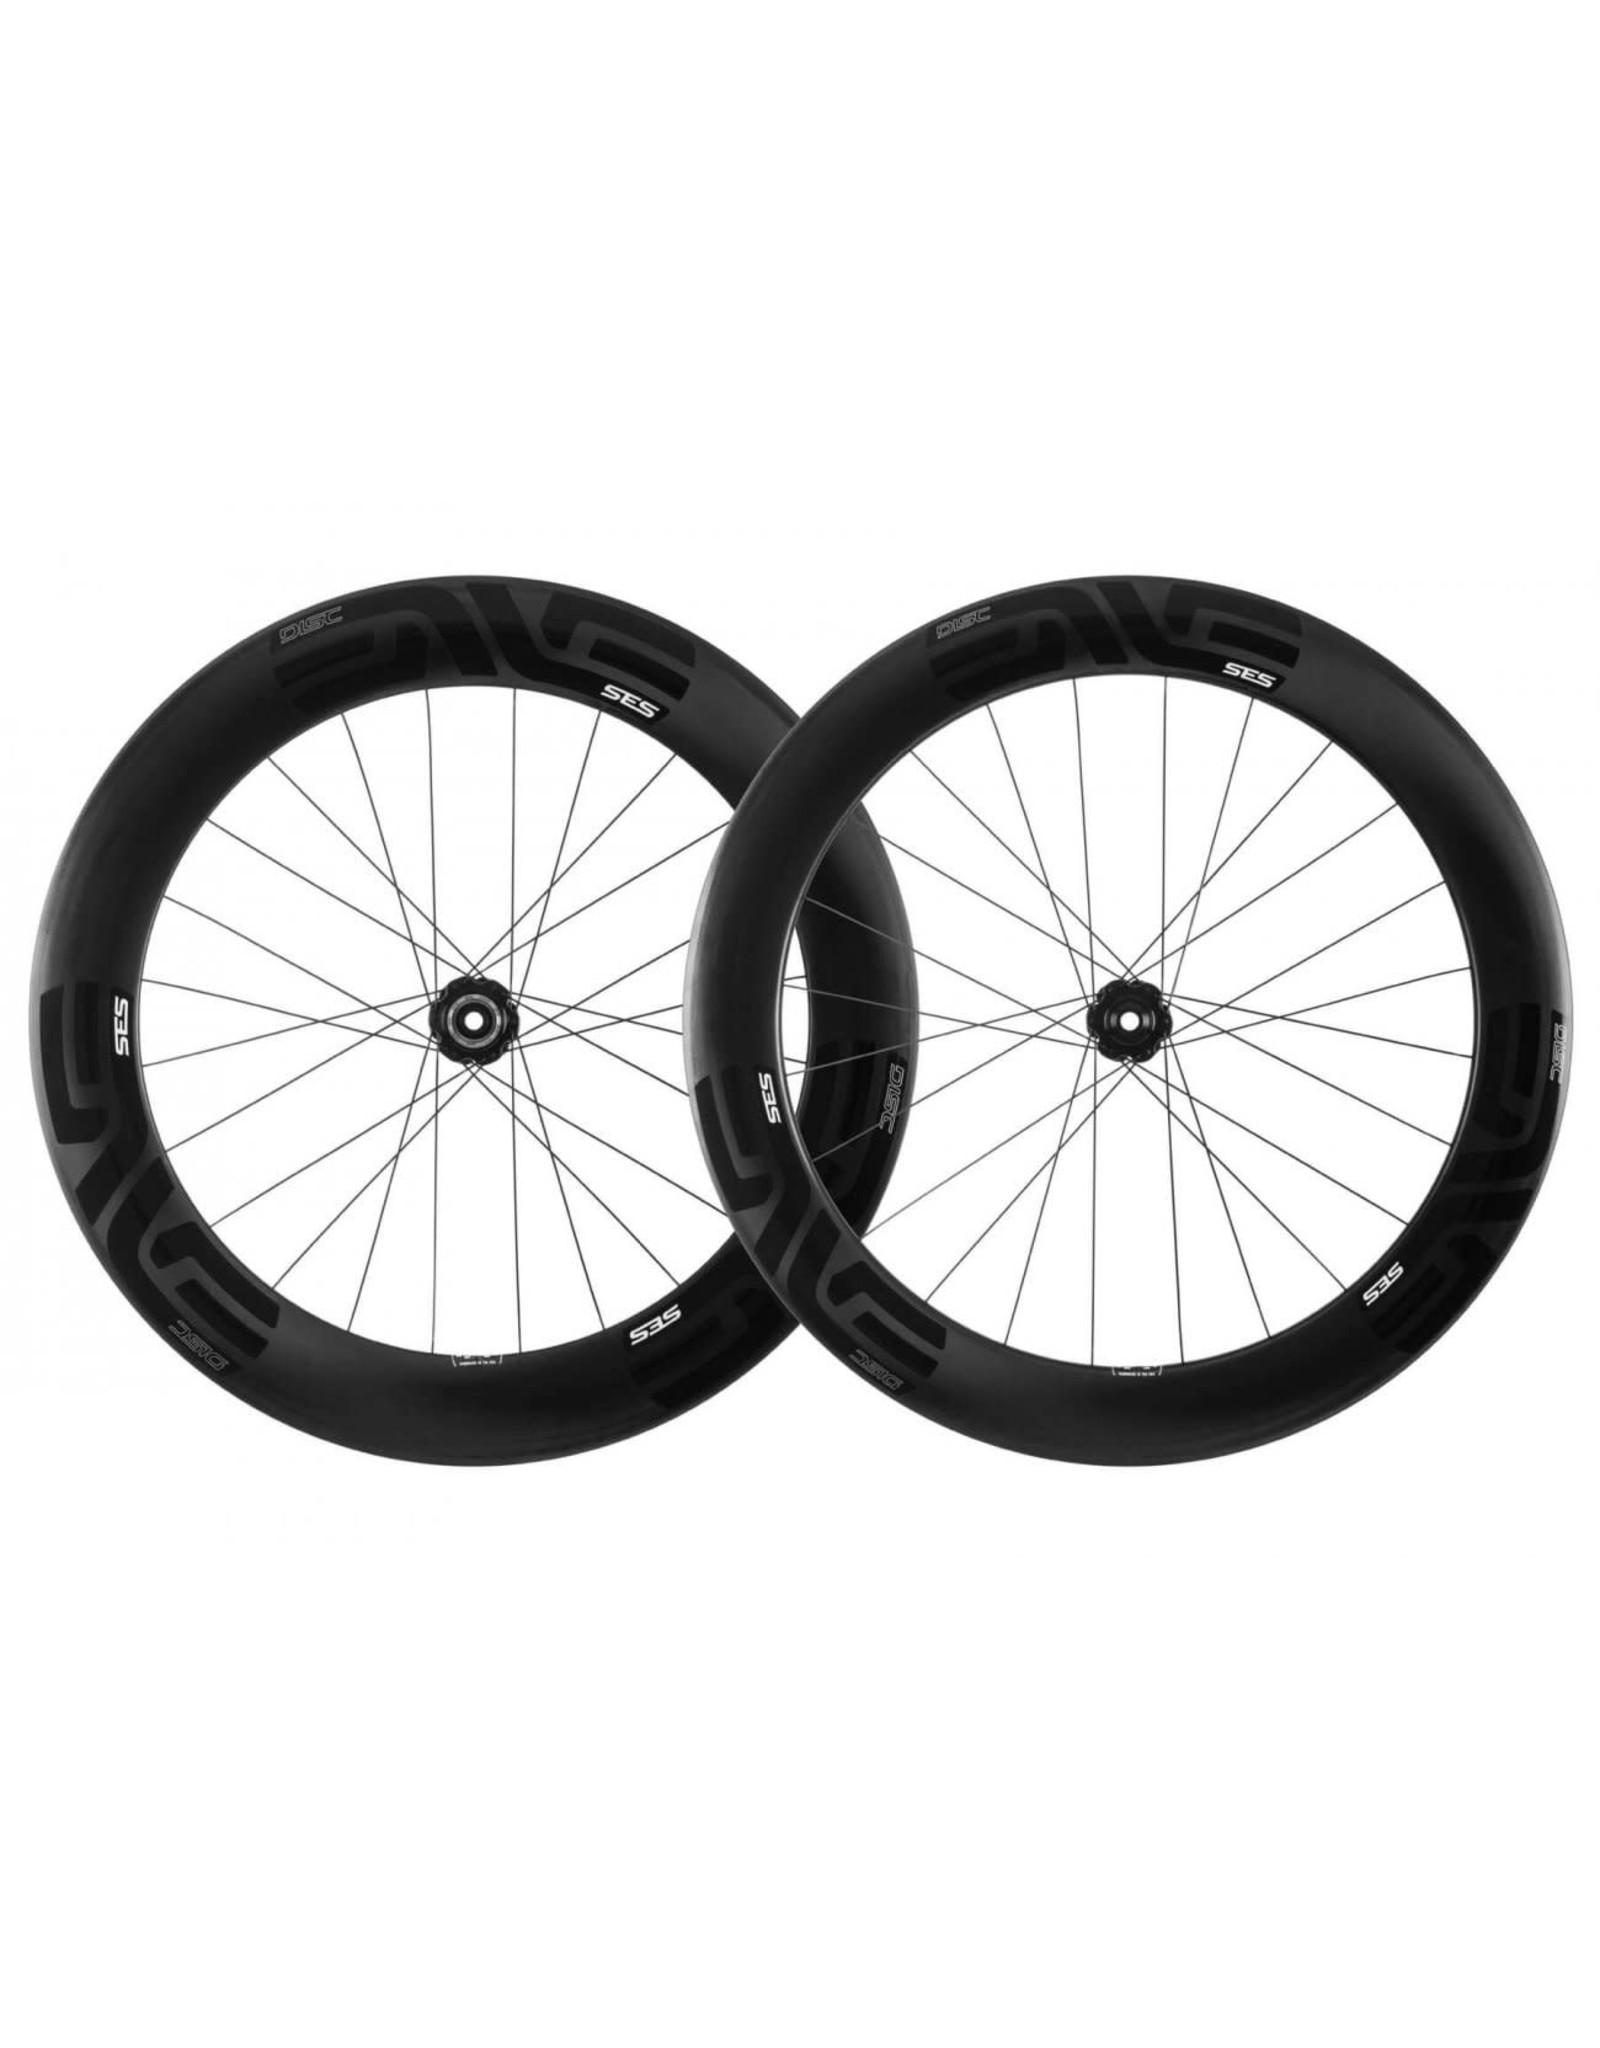 ENVE Composites ENVE SES 7.8 Disc Wheelset - DT Swiss 240 (Shimano/SRAM)